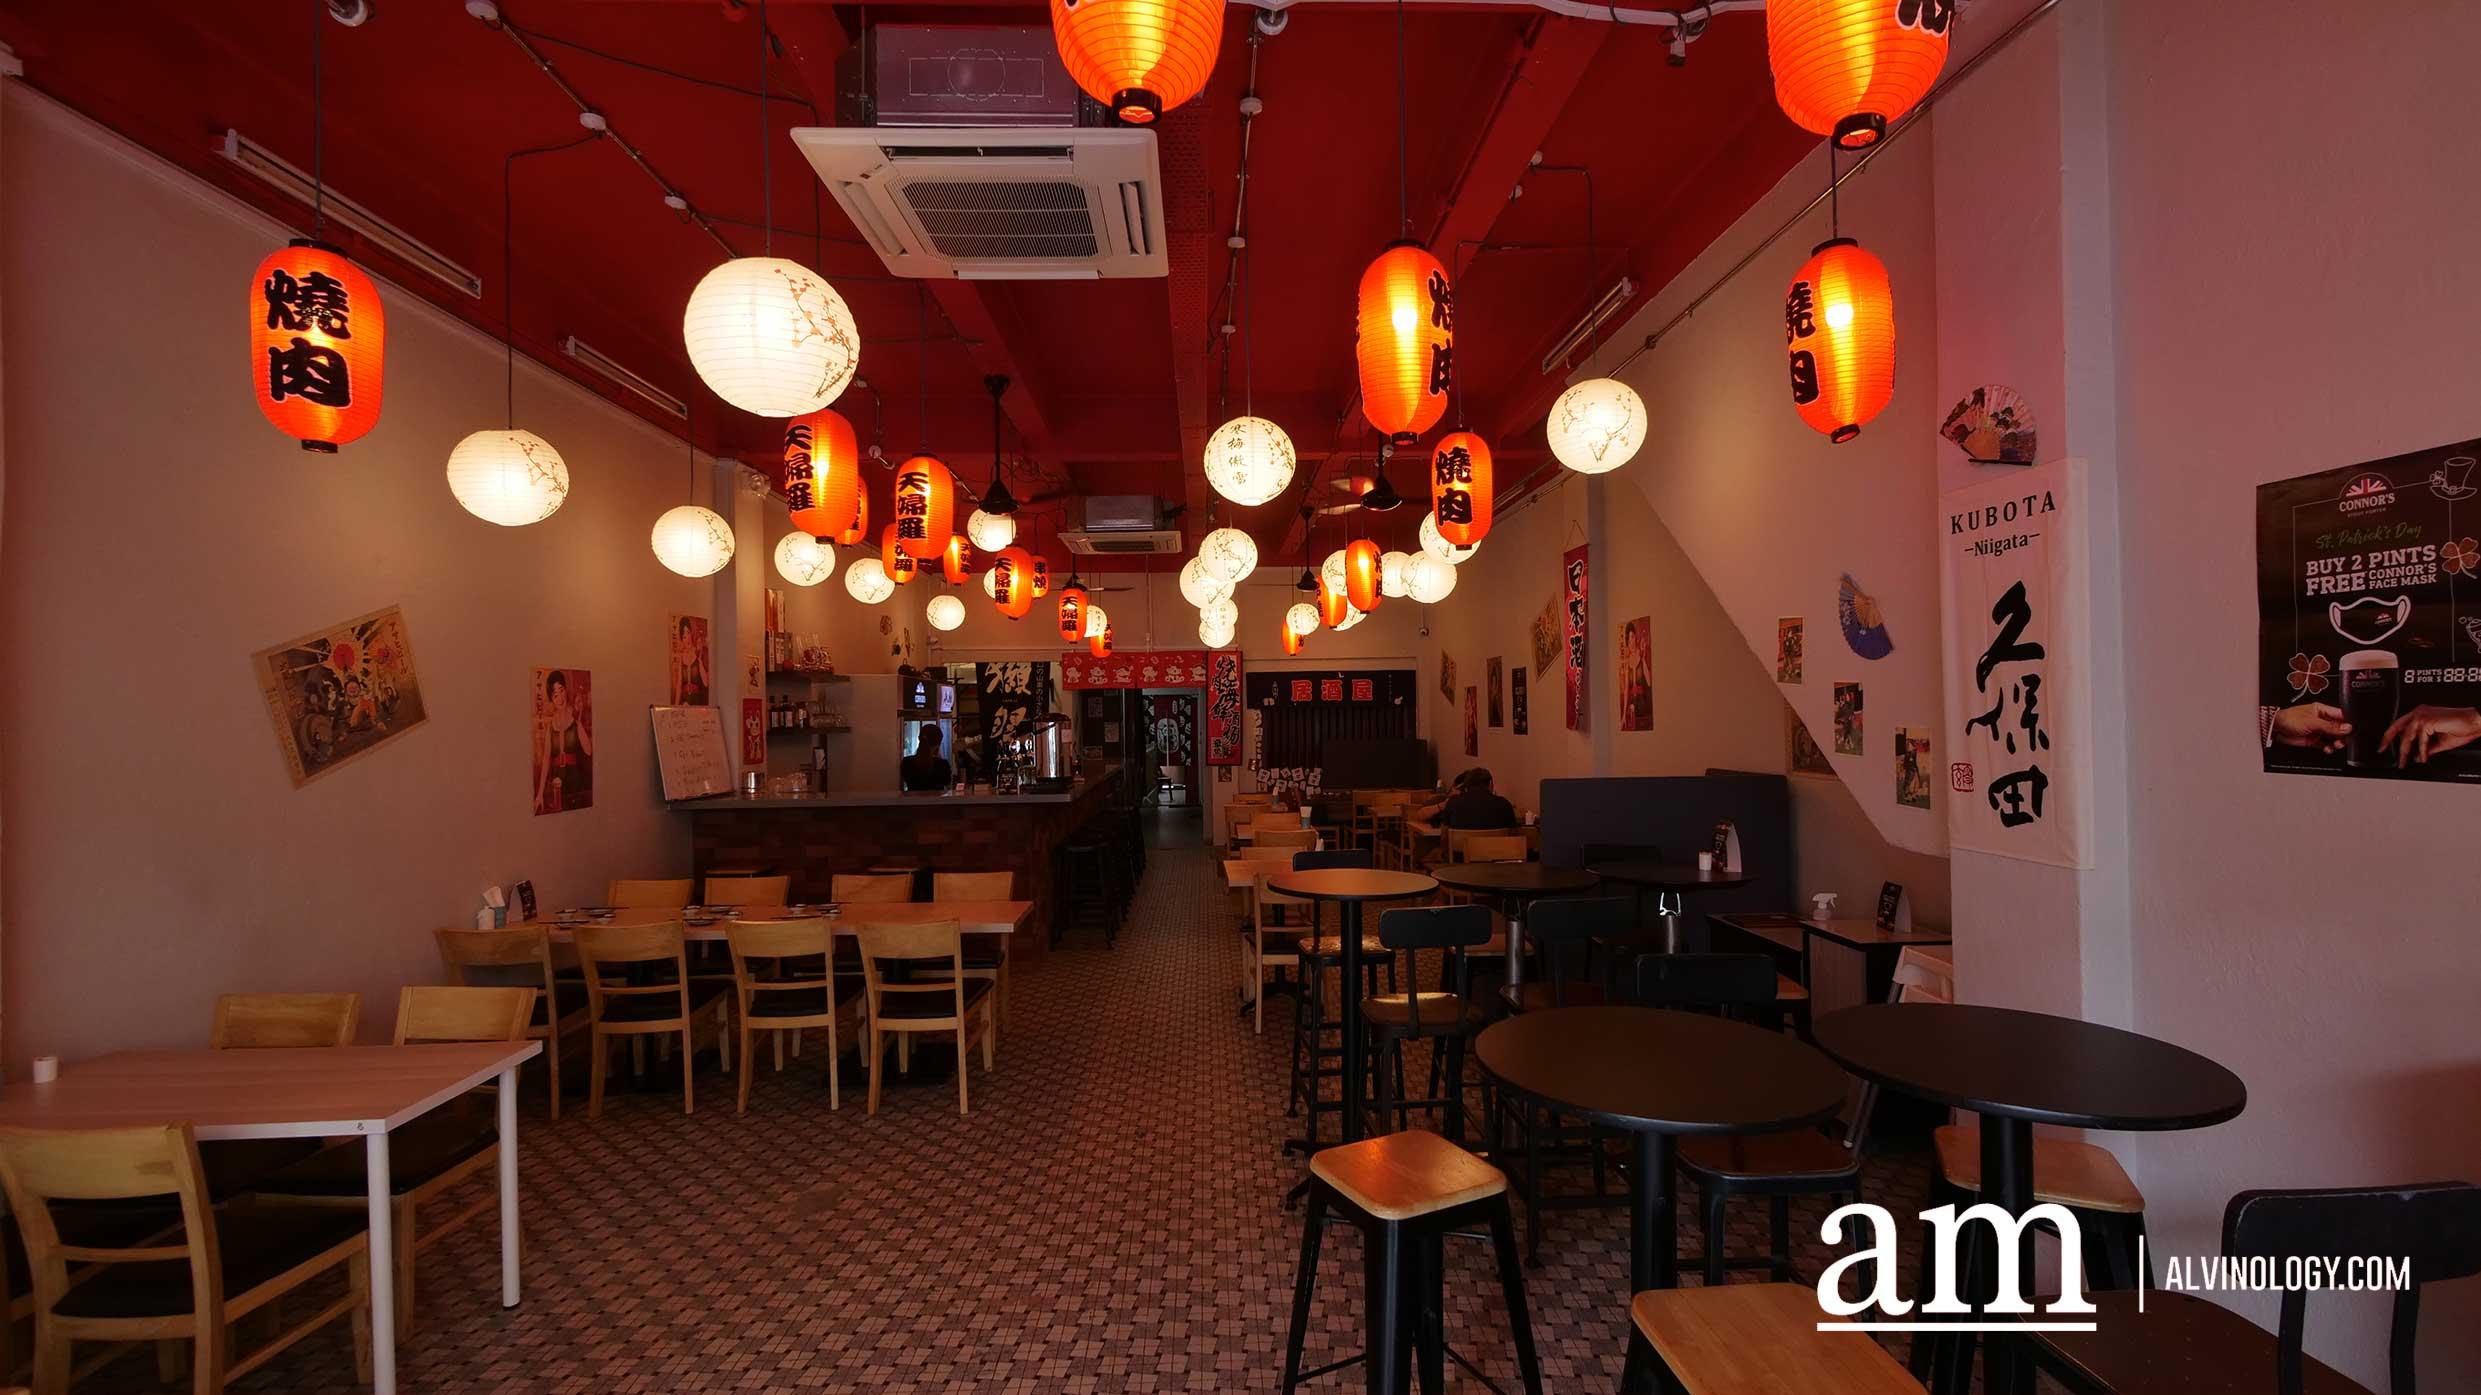 [Review] Hinode Izakaya & Bar at Hamilton Road - Alvinology